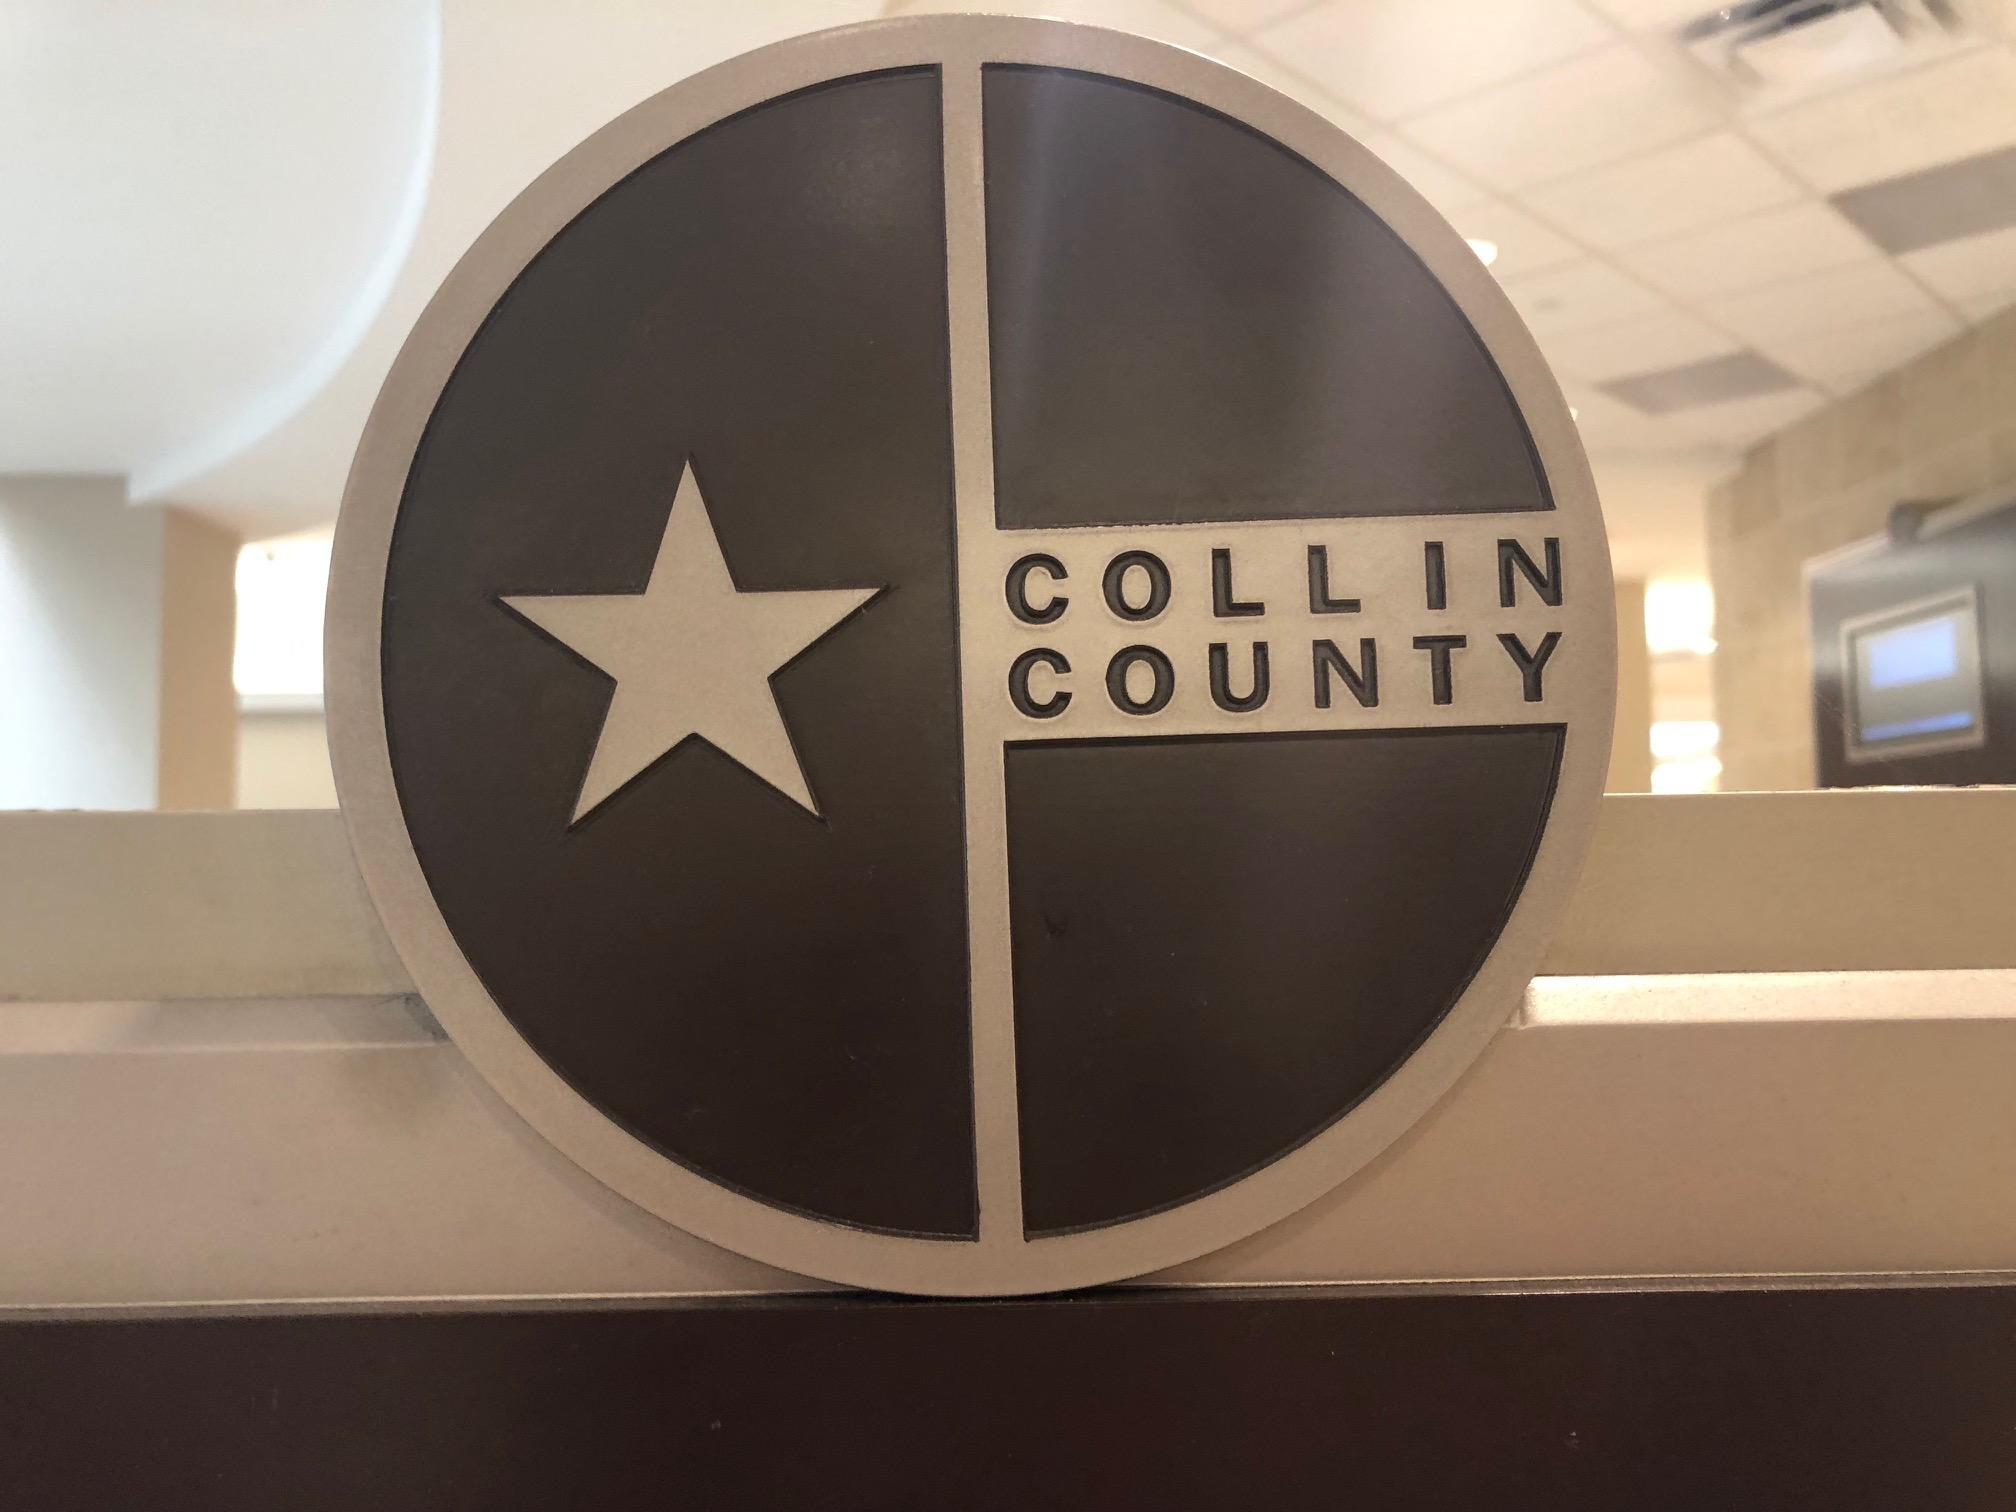 Collin County.jpg